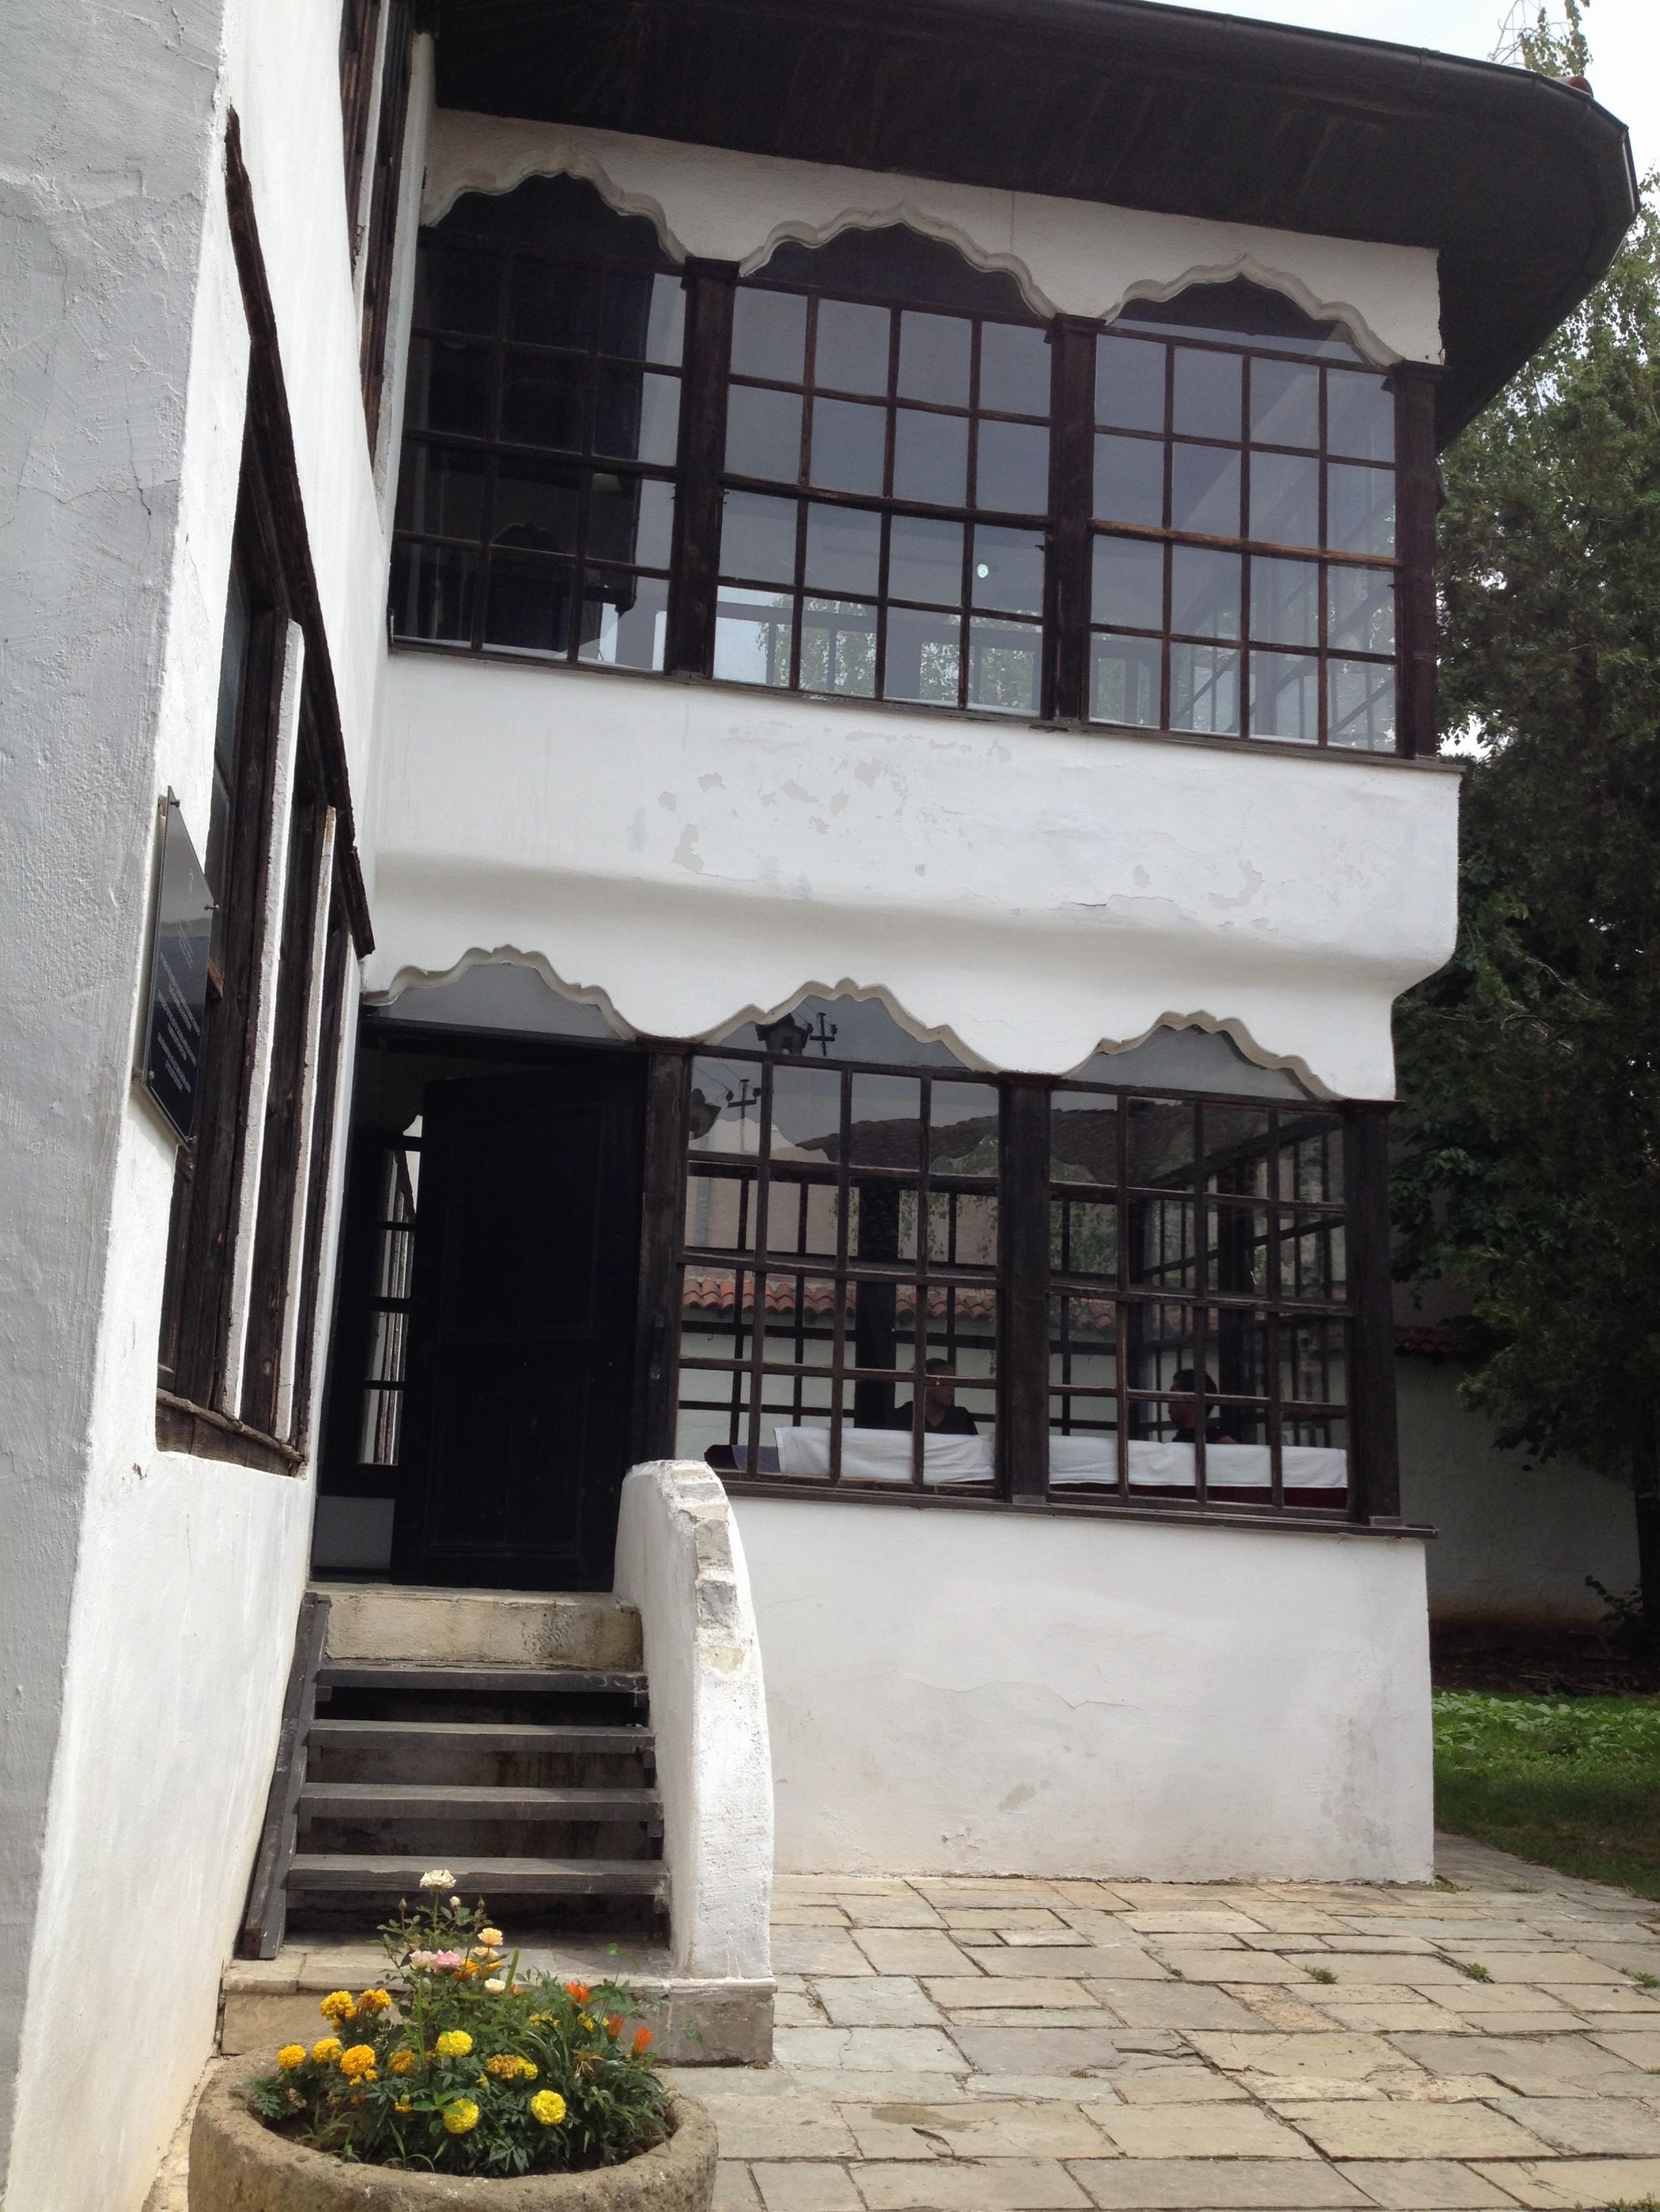 Ethnological Museum